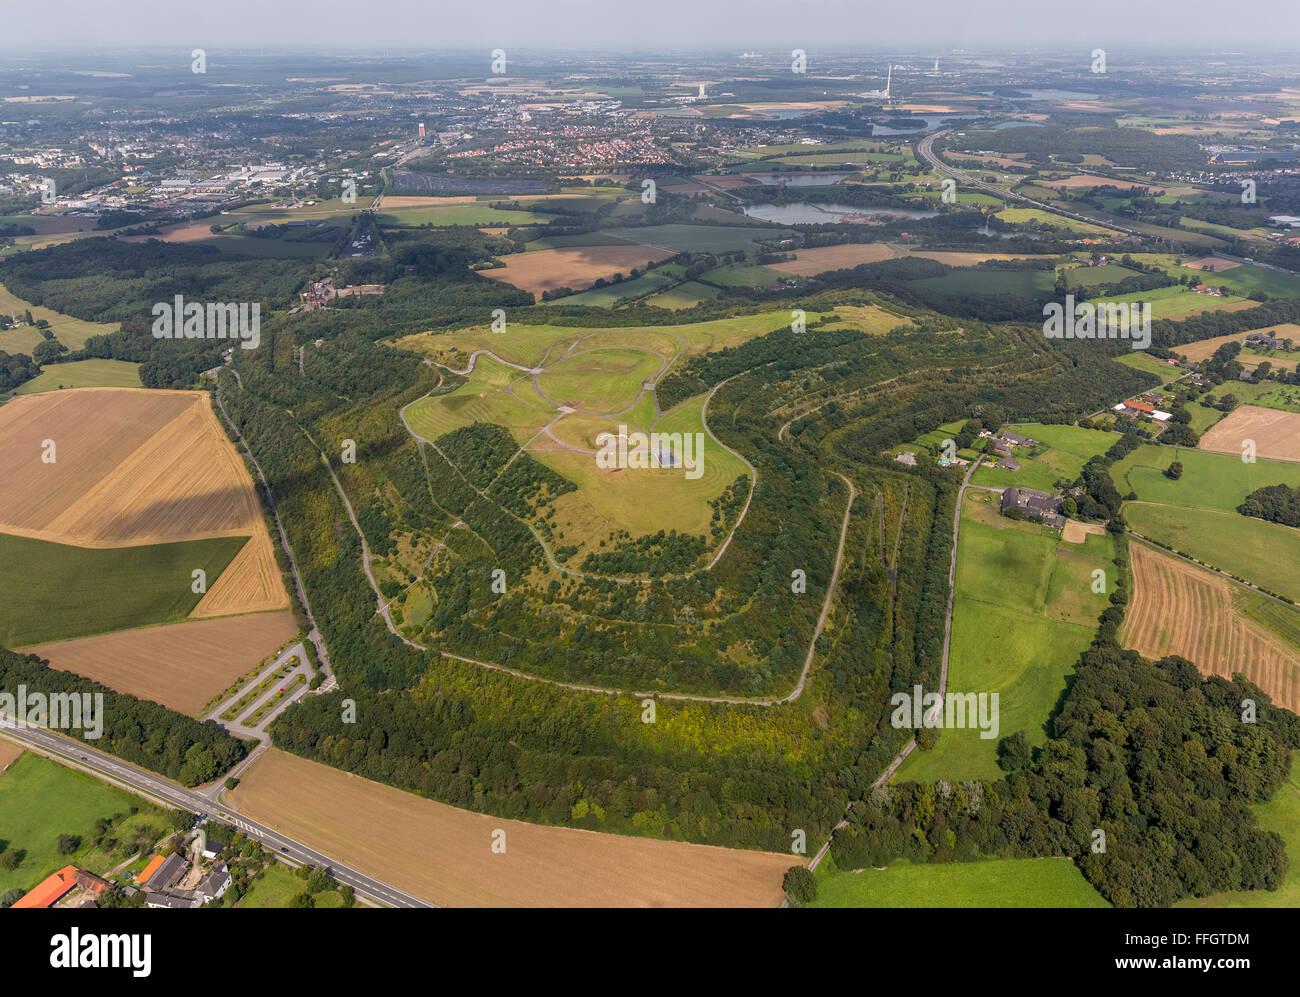 Aerial view, Halde Nord Germany, Neukirchen, Lower Rhine, North Rhine-Westphalia, Germany, Europe, Aerial view, - Stock Image